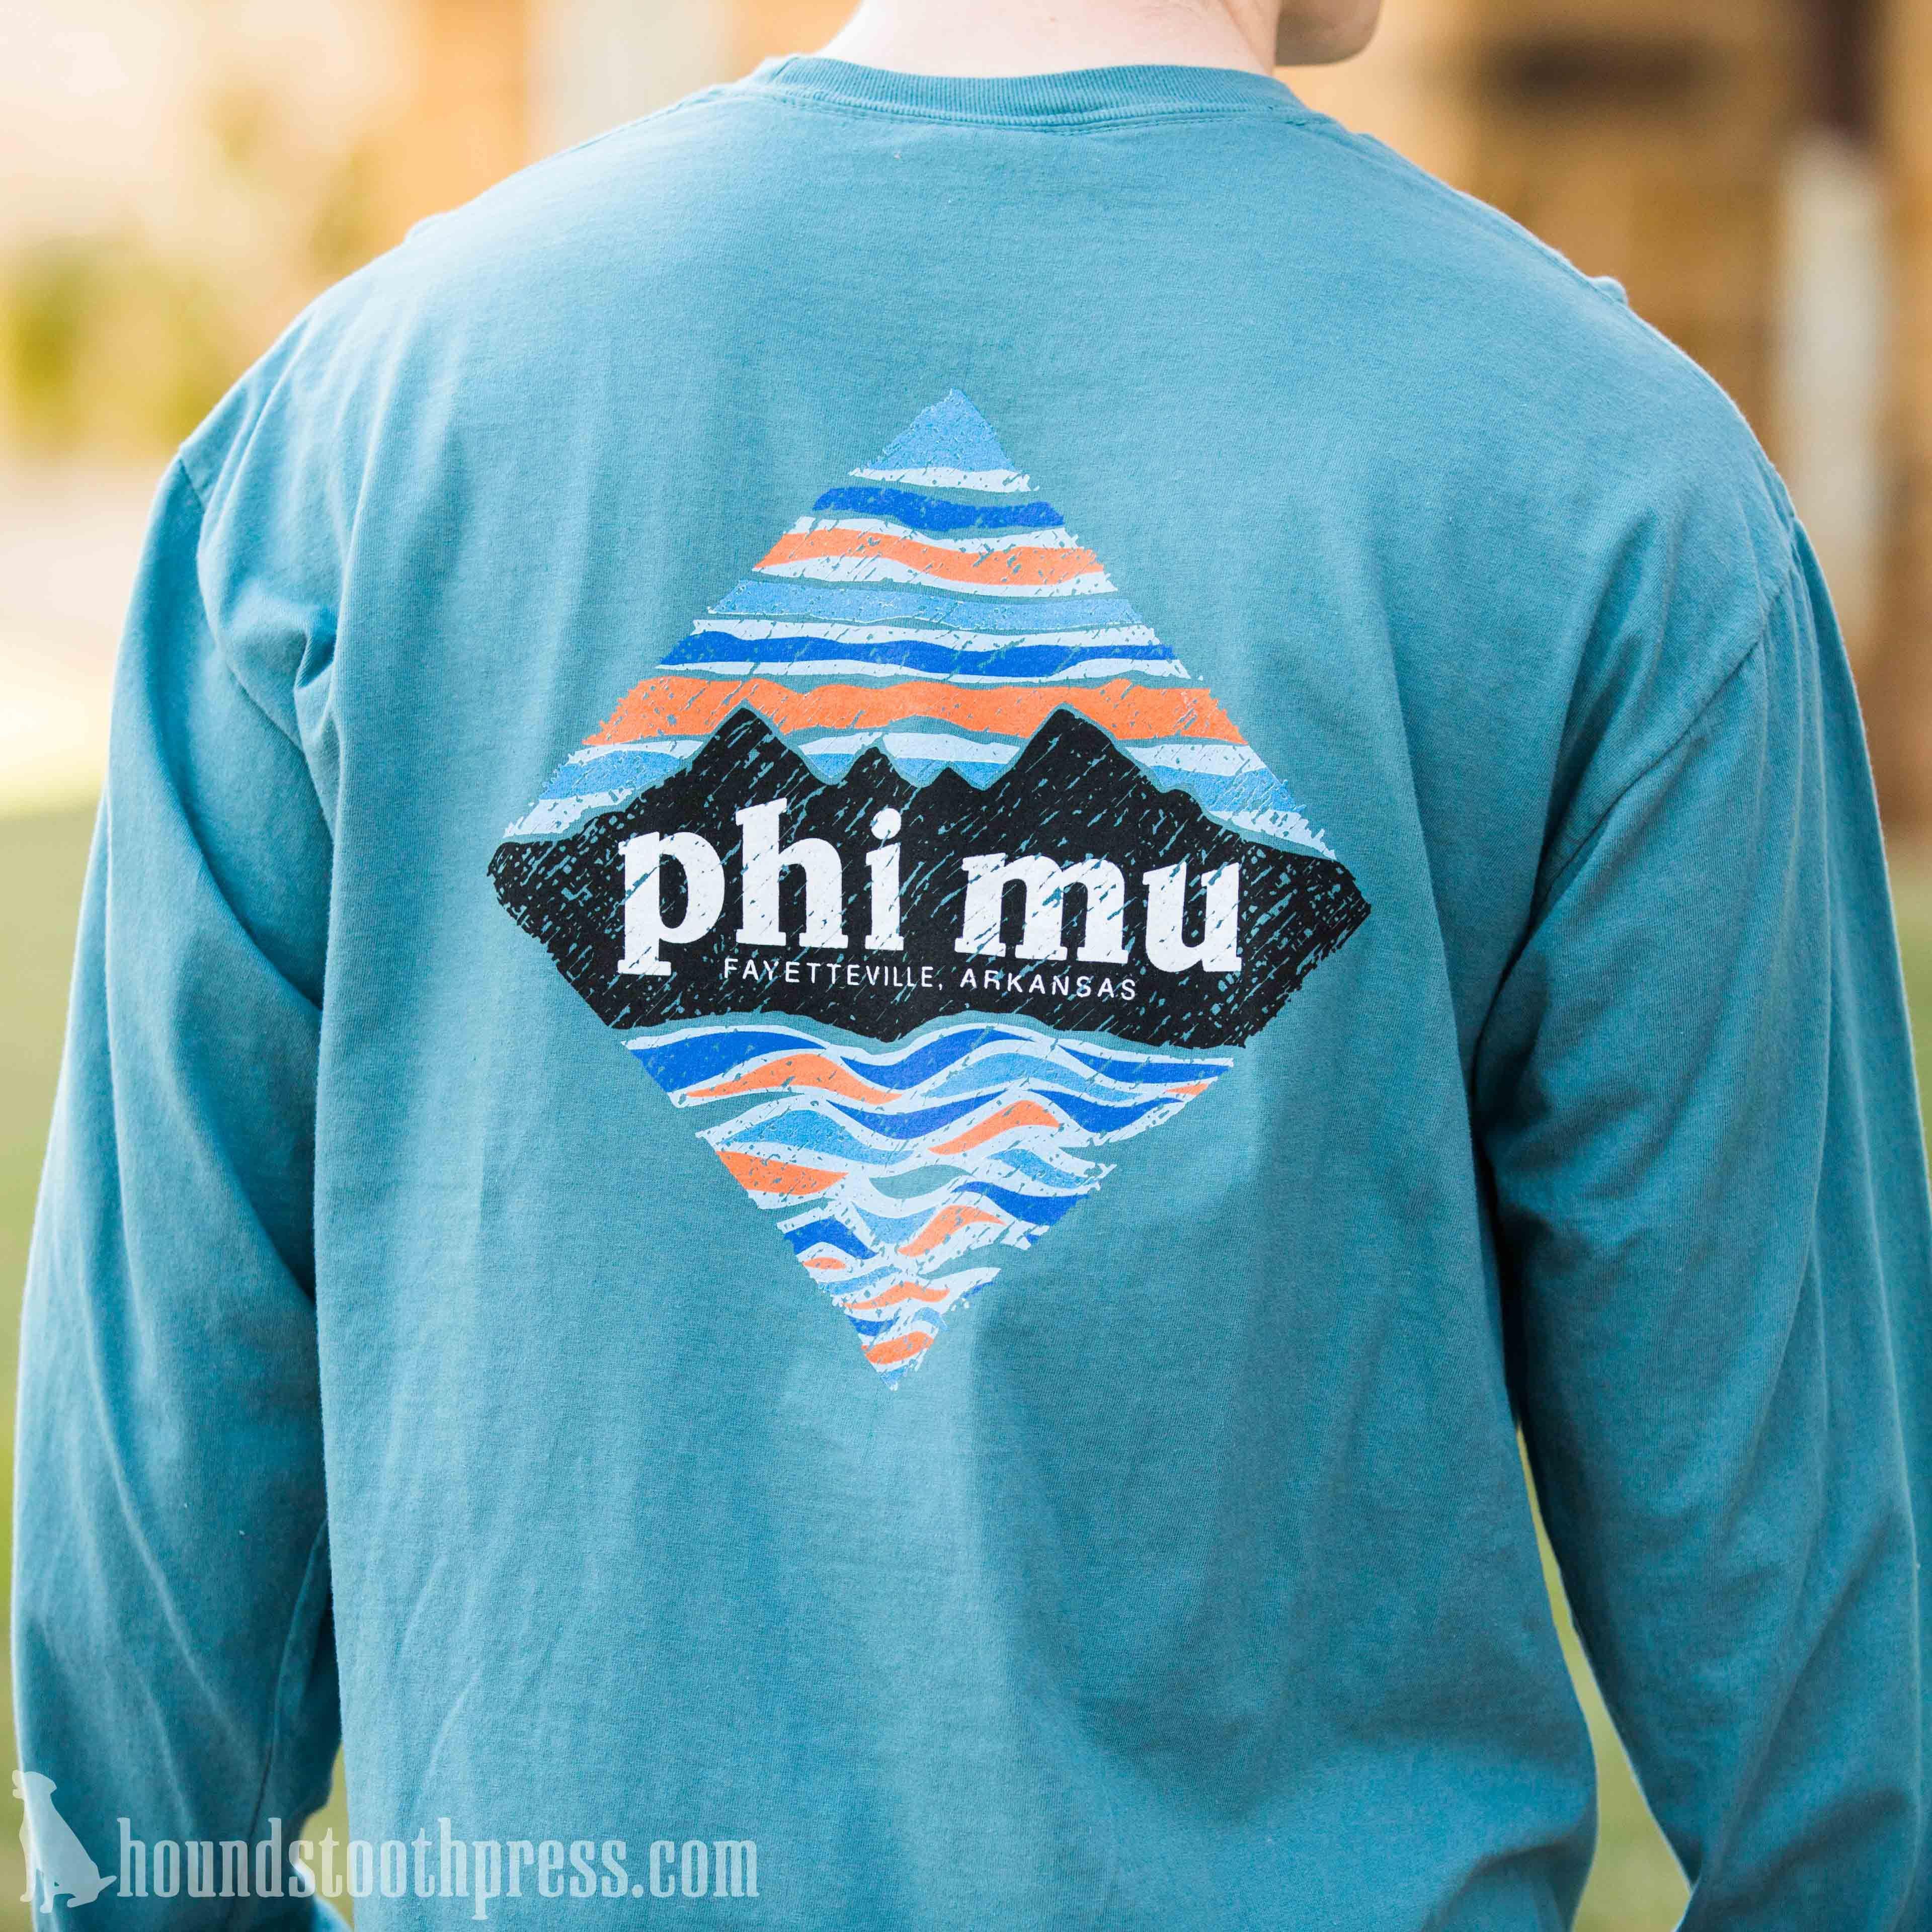 Phi mu patagonia long sleeve t shirt lovethelab for Sorority t shirts designs